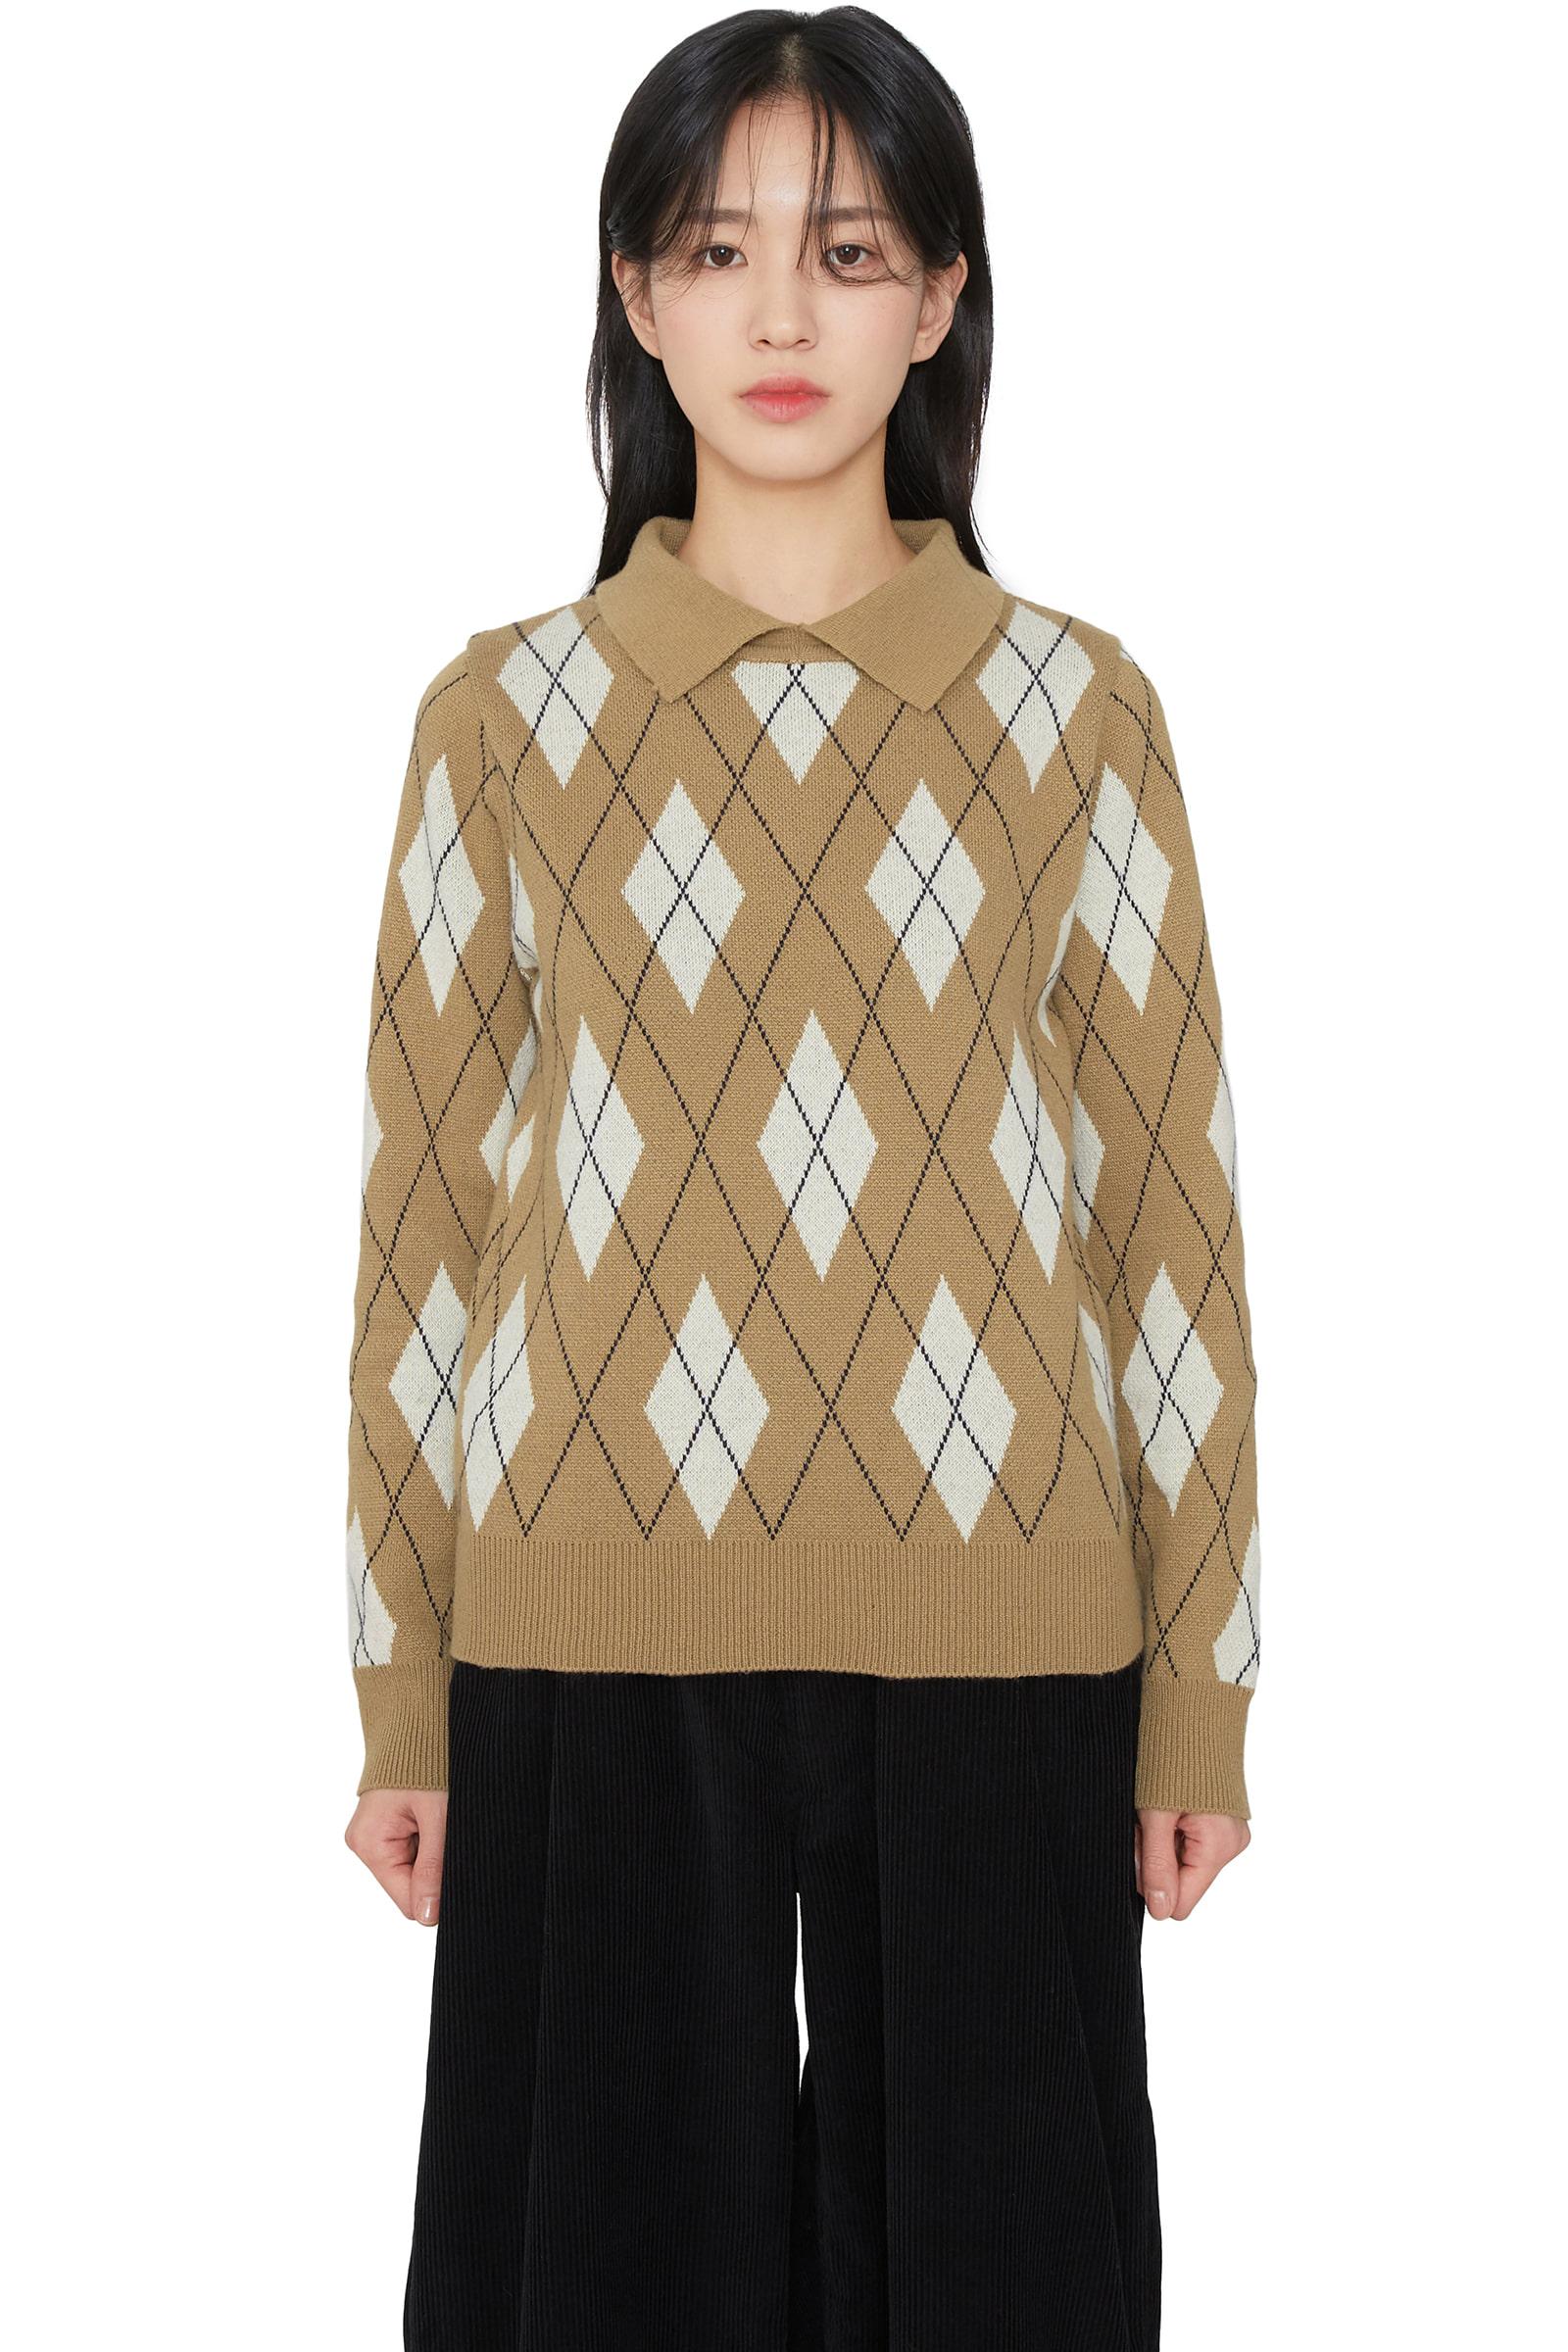 Cashmere argyle collar knit top